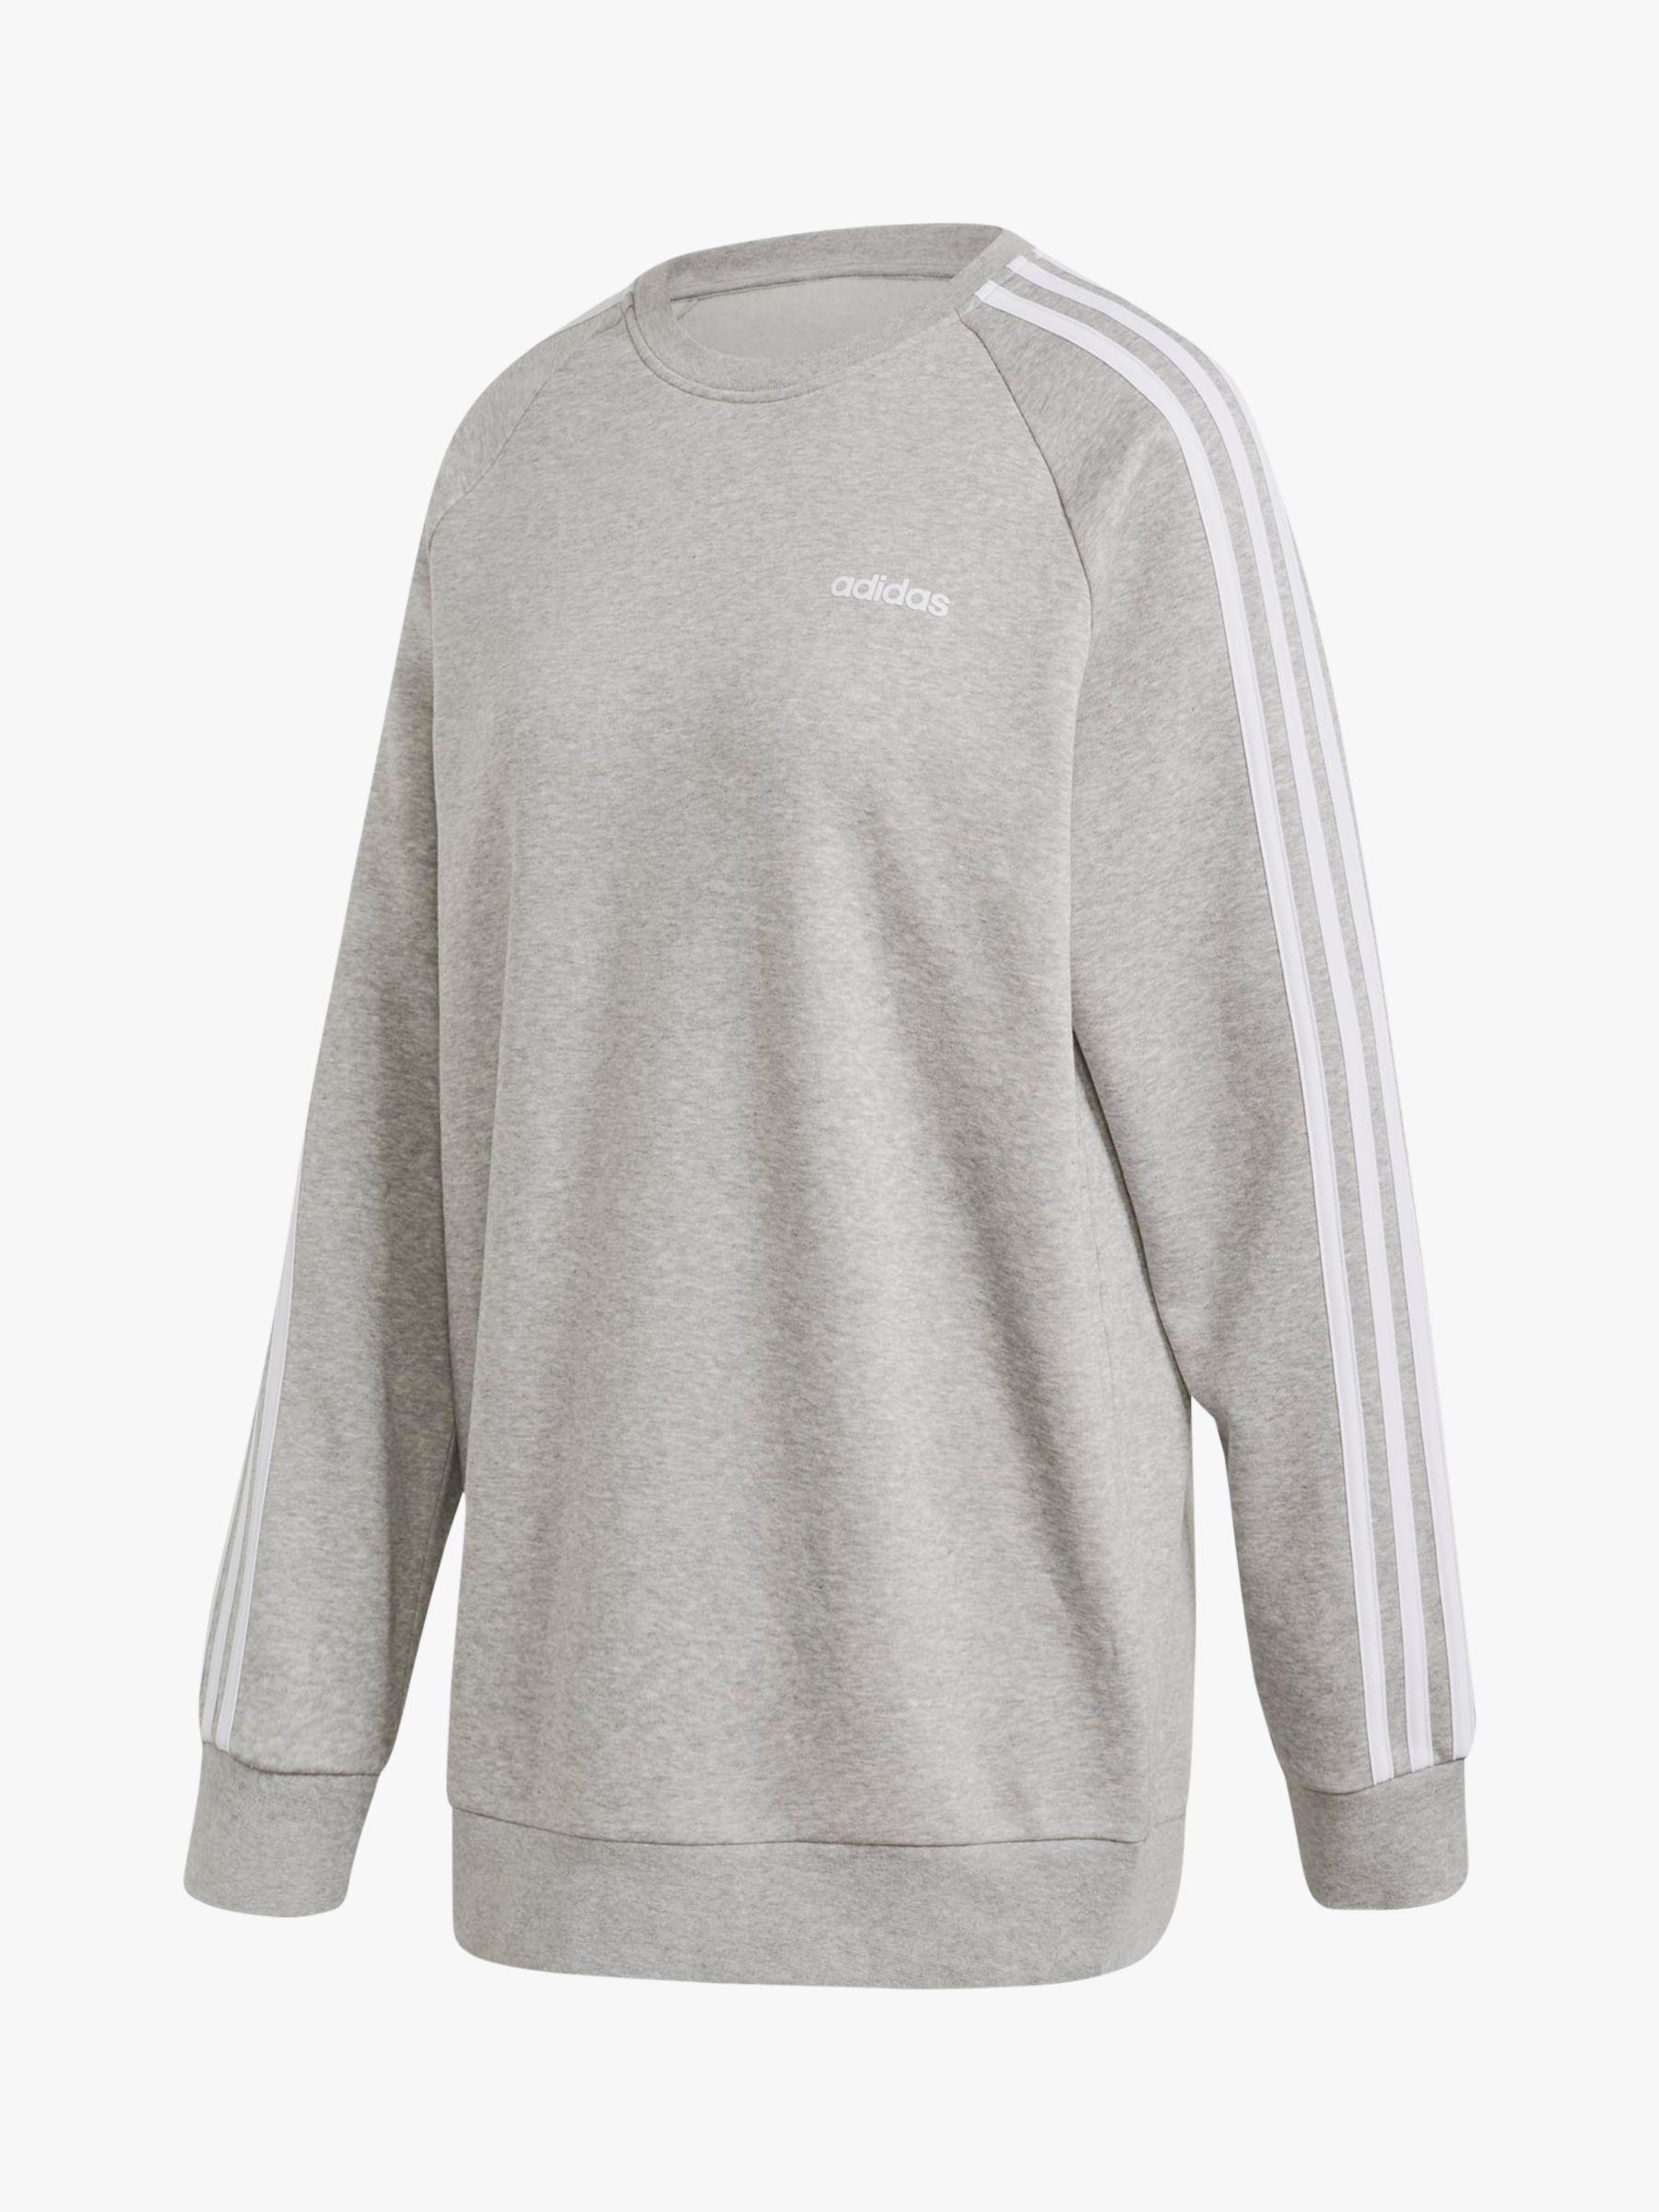 adidas Essentials Boyfriend Crew Sweatshirt, Medium Grey